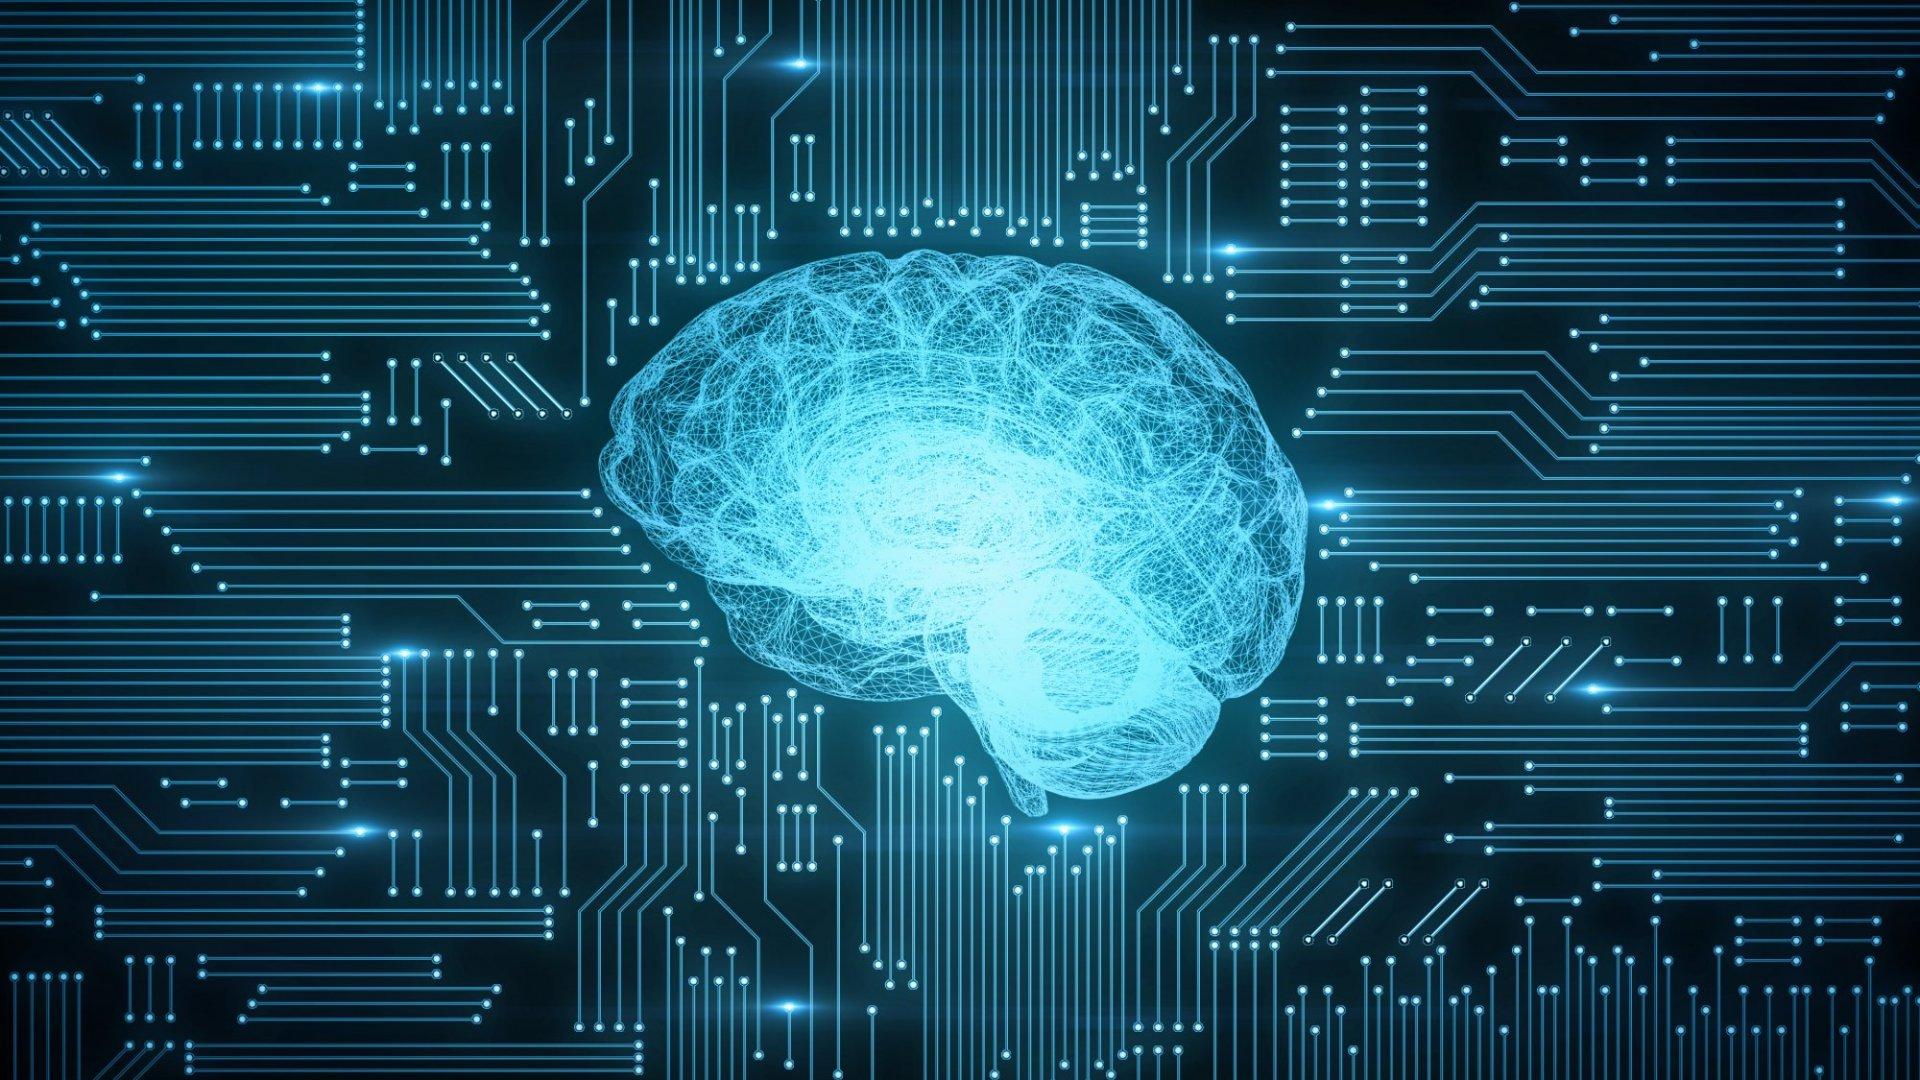 How Will AI Influence the Job Market?